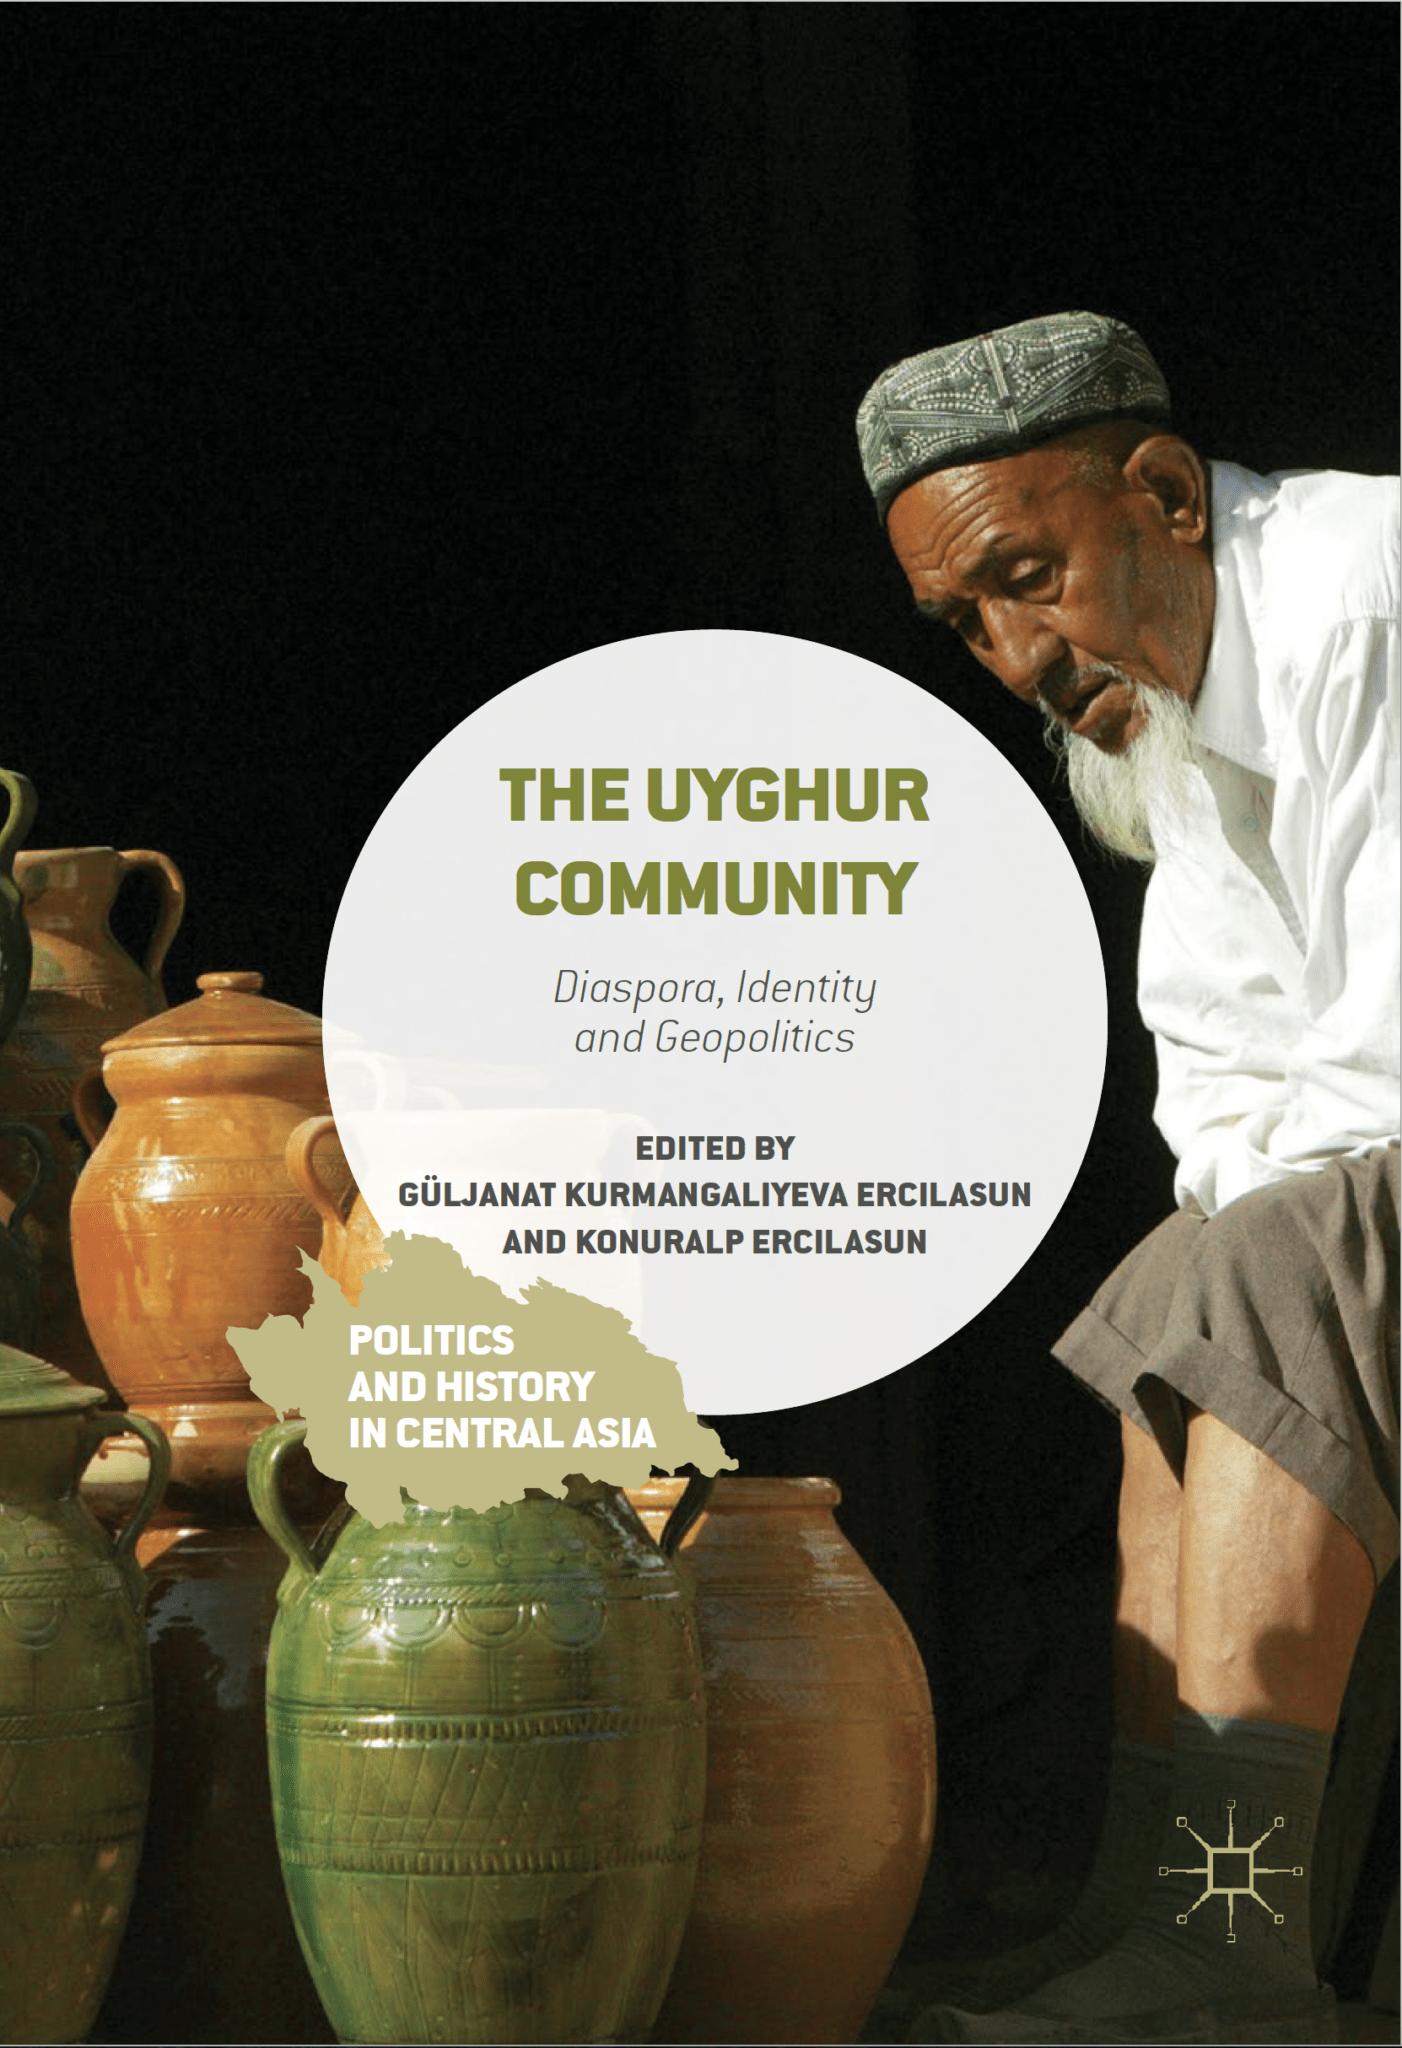 Screenshot 2020 02 01 at 14.39.58 - The Uyghur Community: Diaspora, Identity and Geopolitics